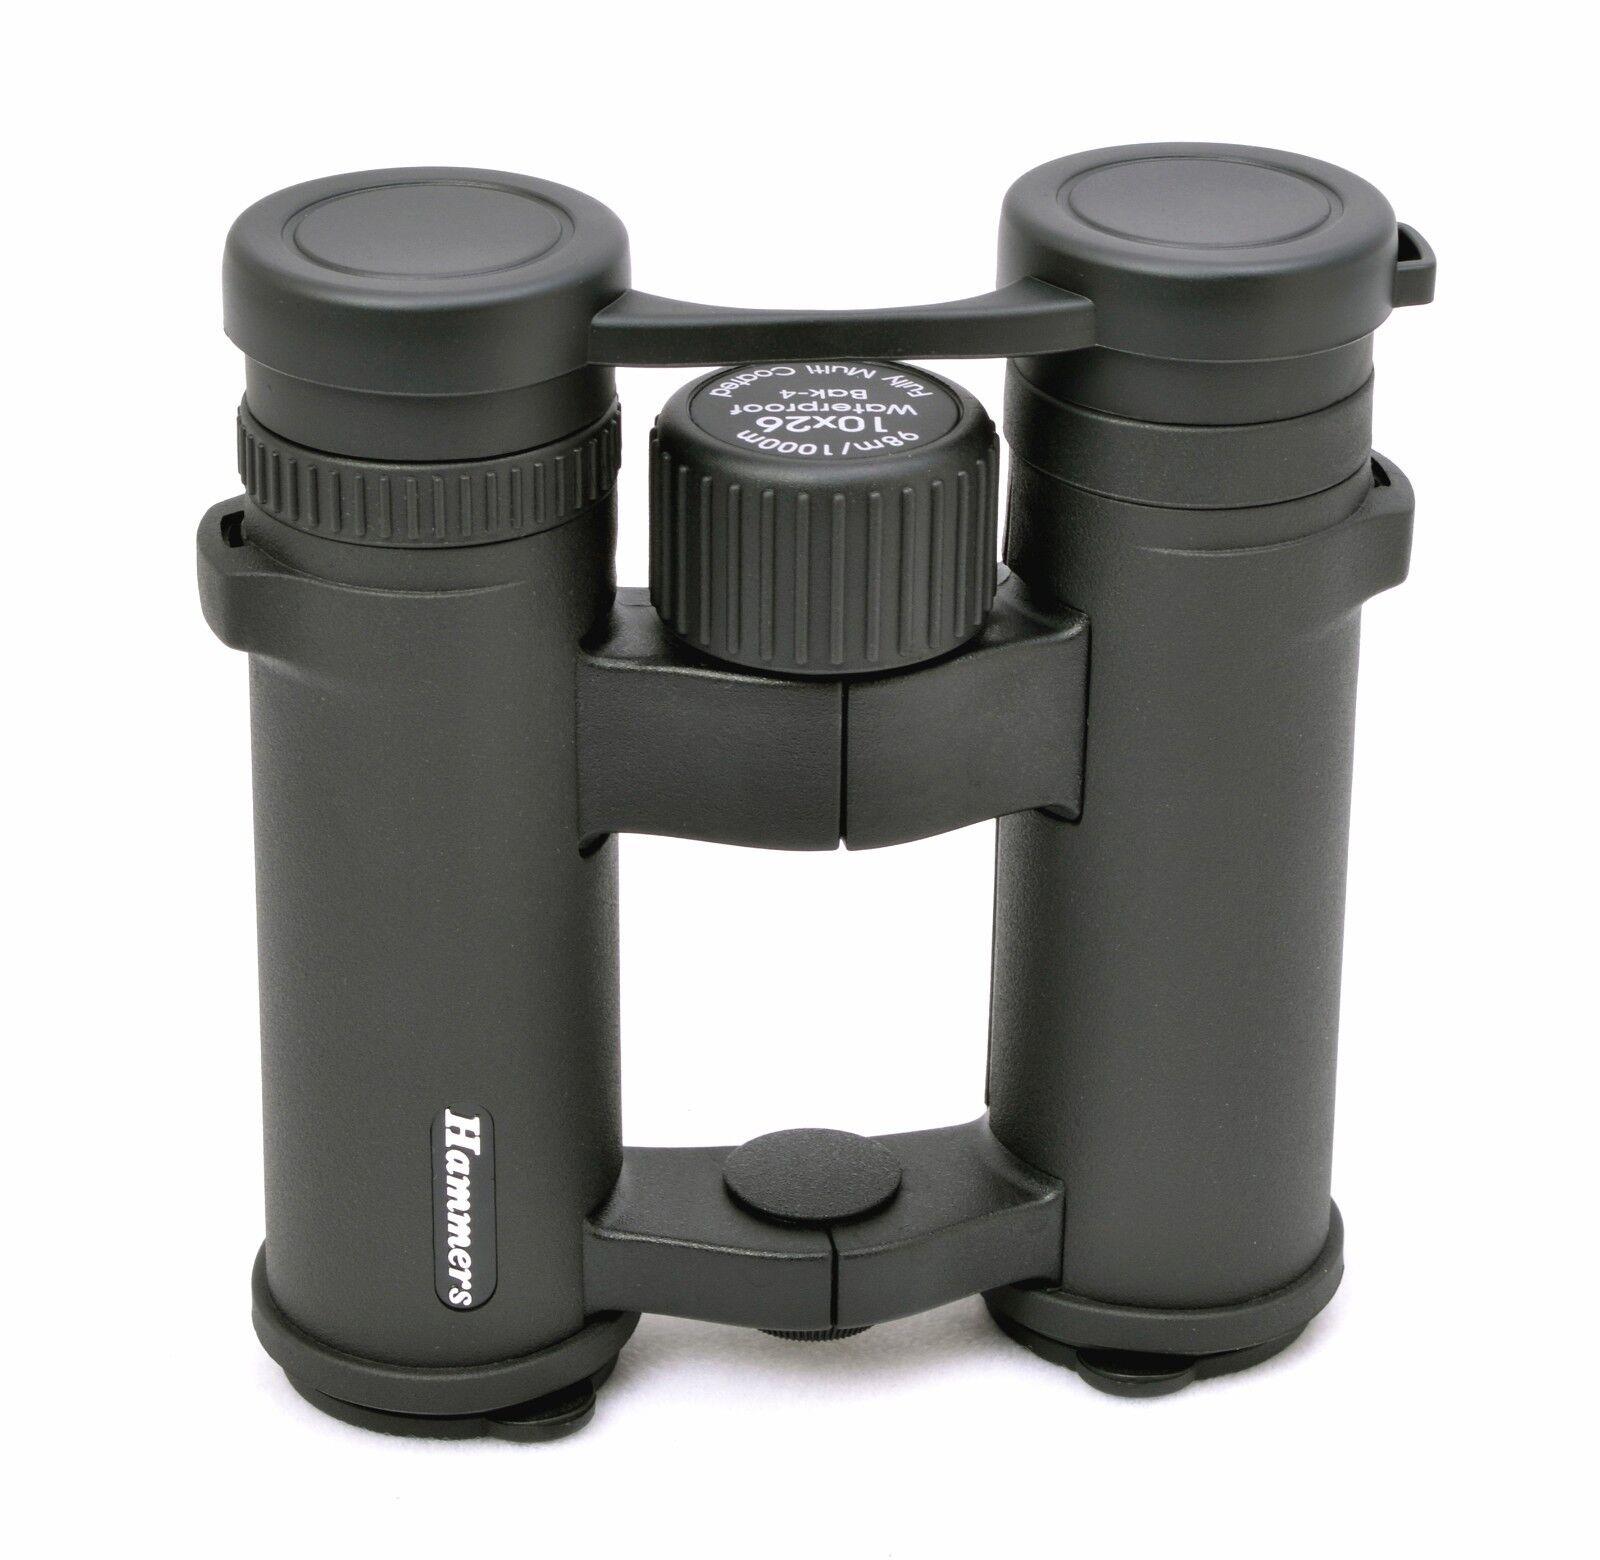 Roof Prism 10X26 Waterproof Compact Small Binocular 4 Wild Life Photographer Use